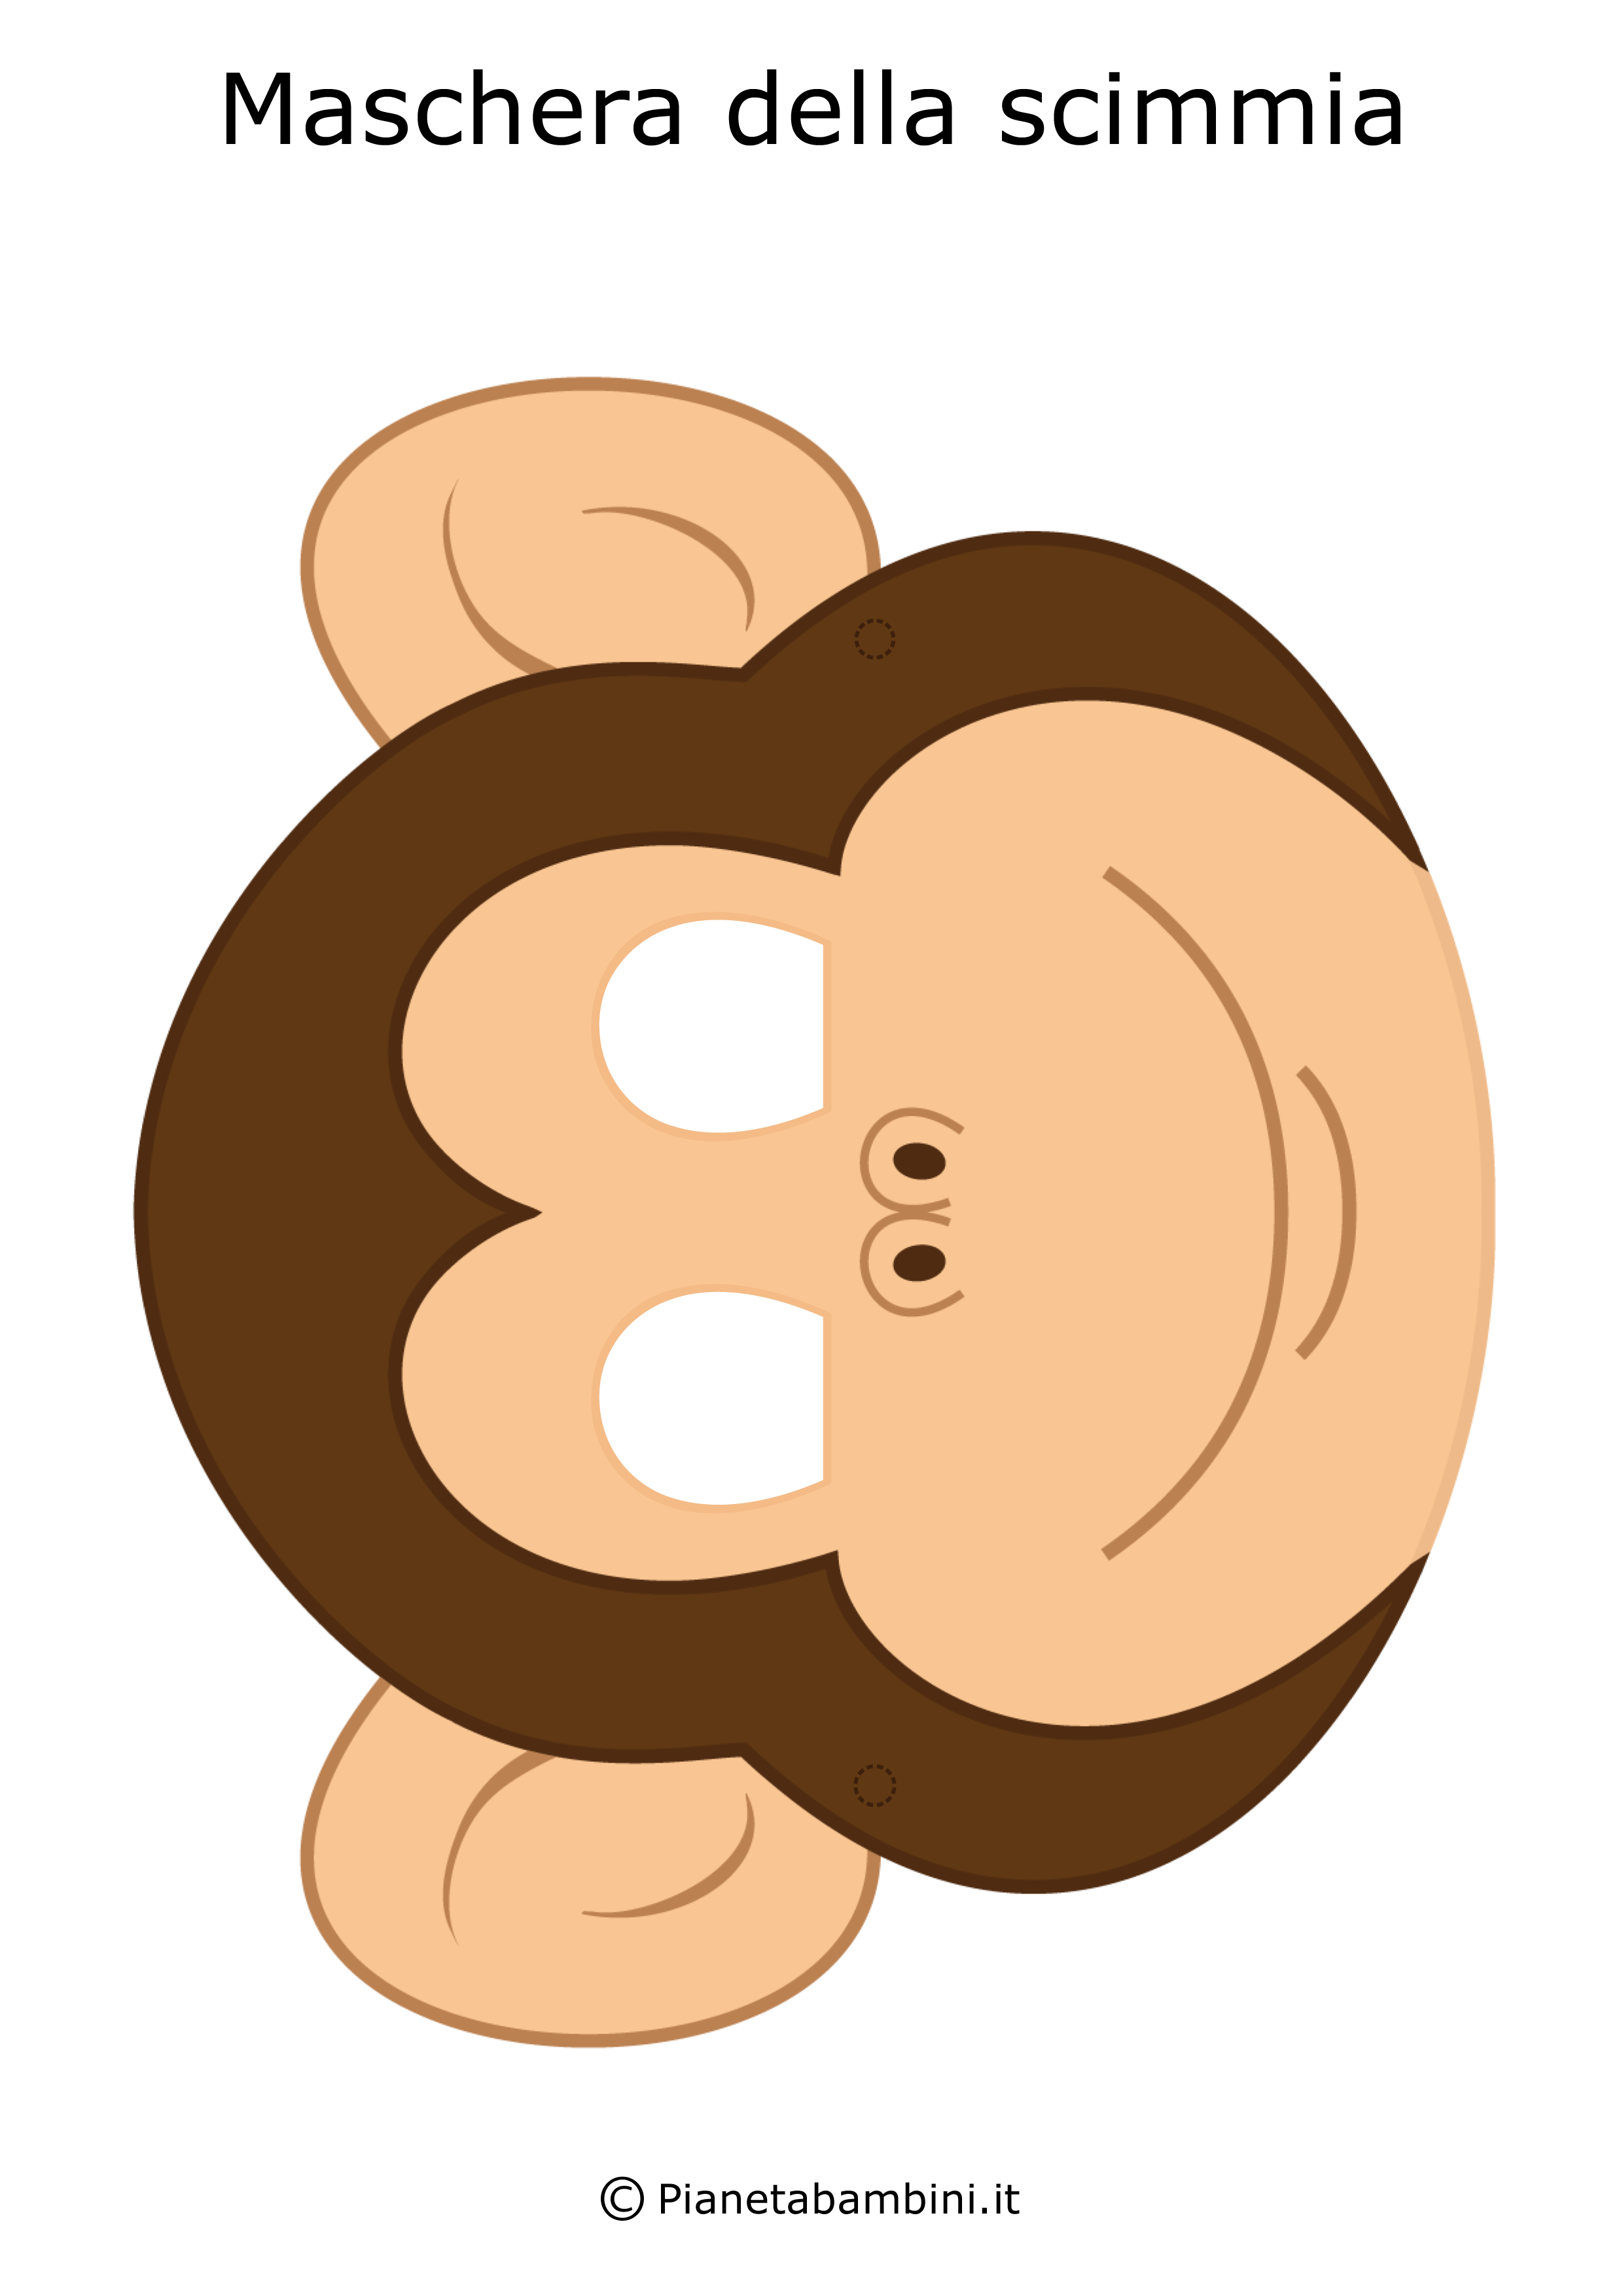 Immagine maschera da scimmia